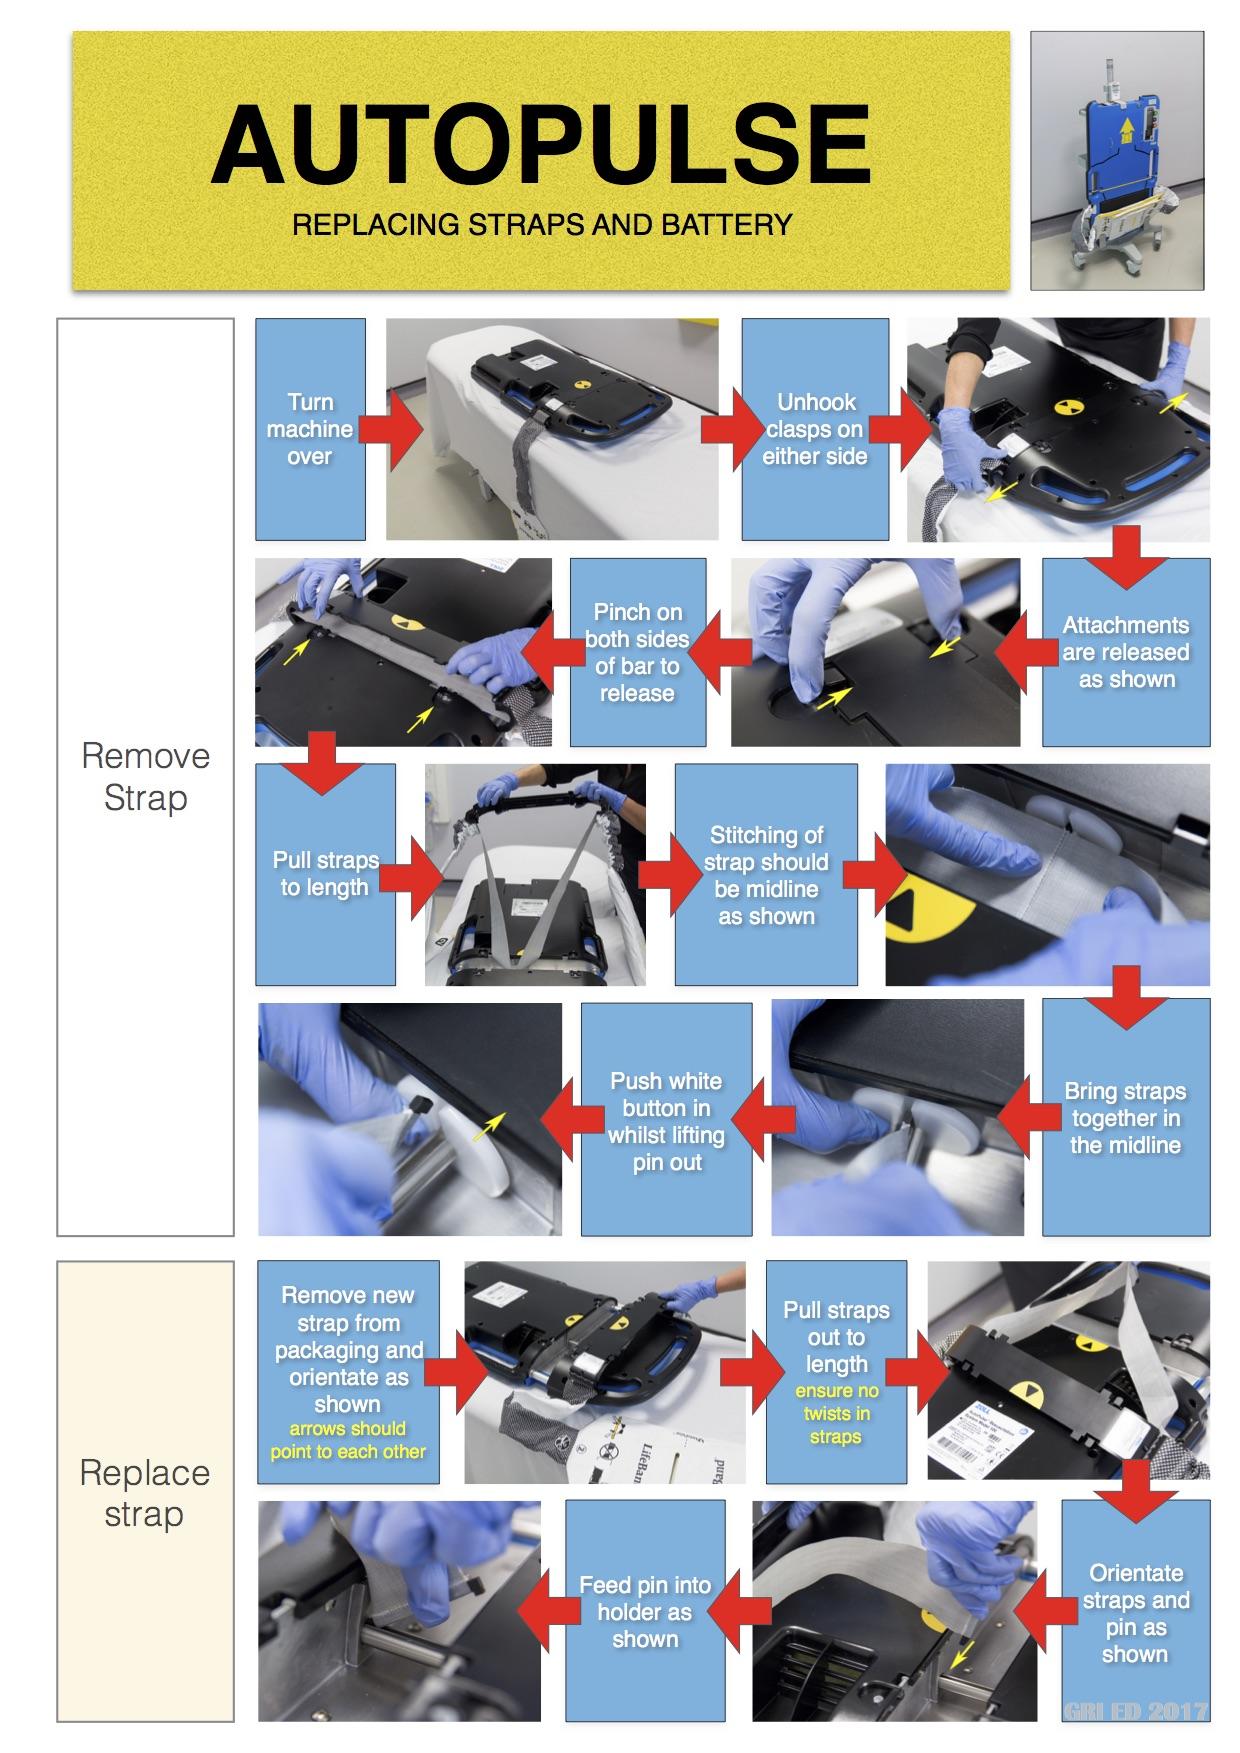 Autopulse Straps & Battery JPEG 1.jpg